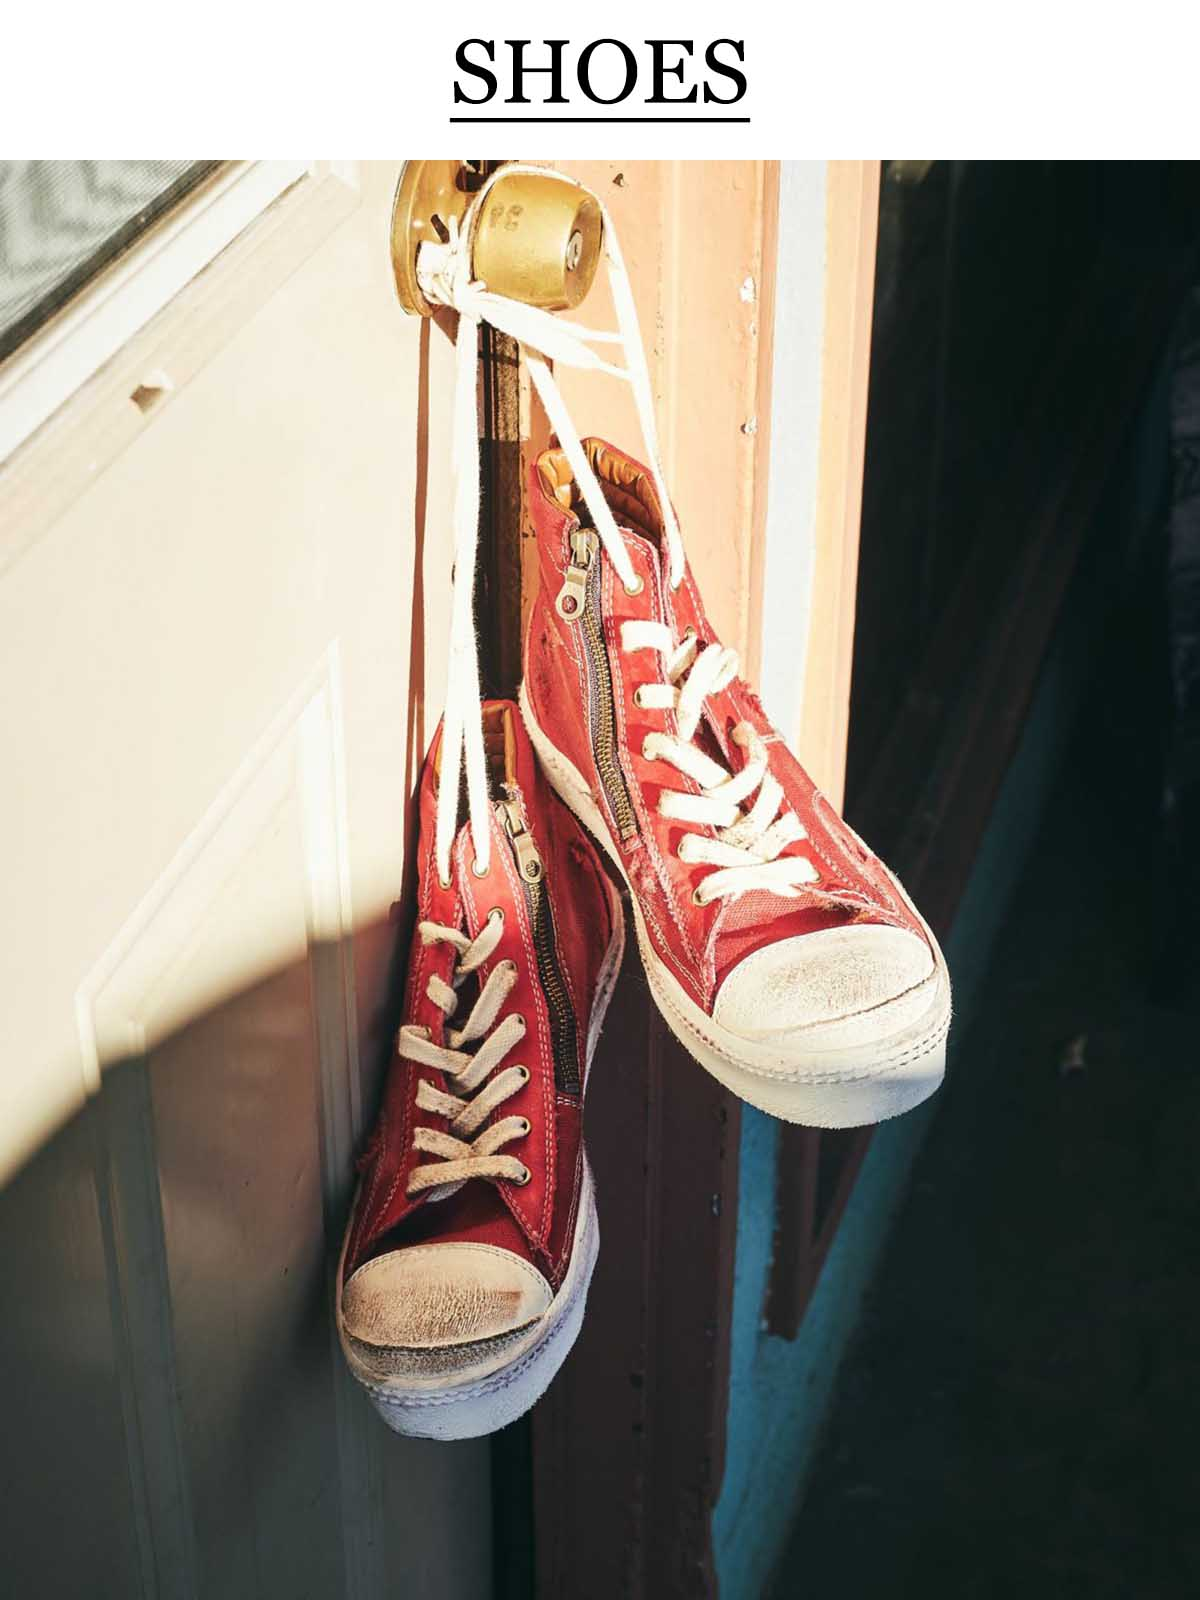 21sm_orderranking_shoes.jpg